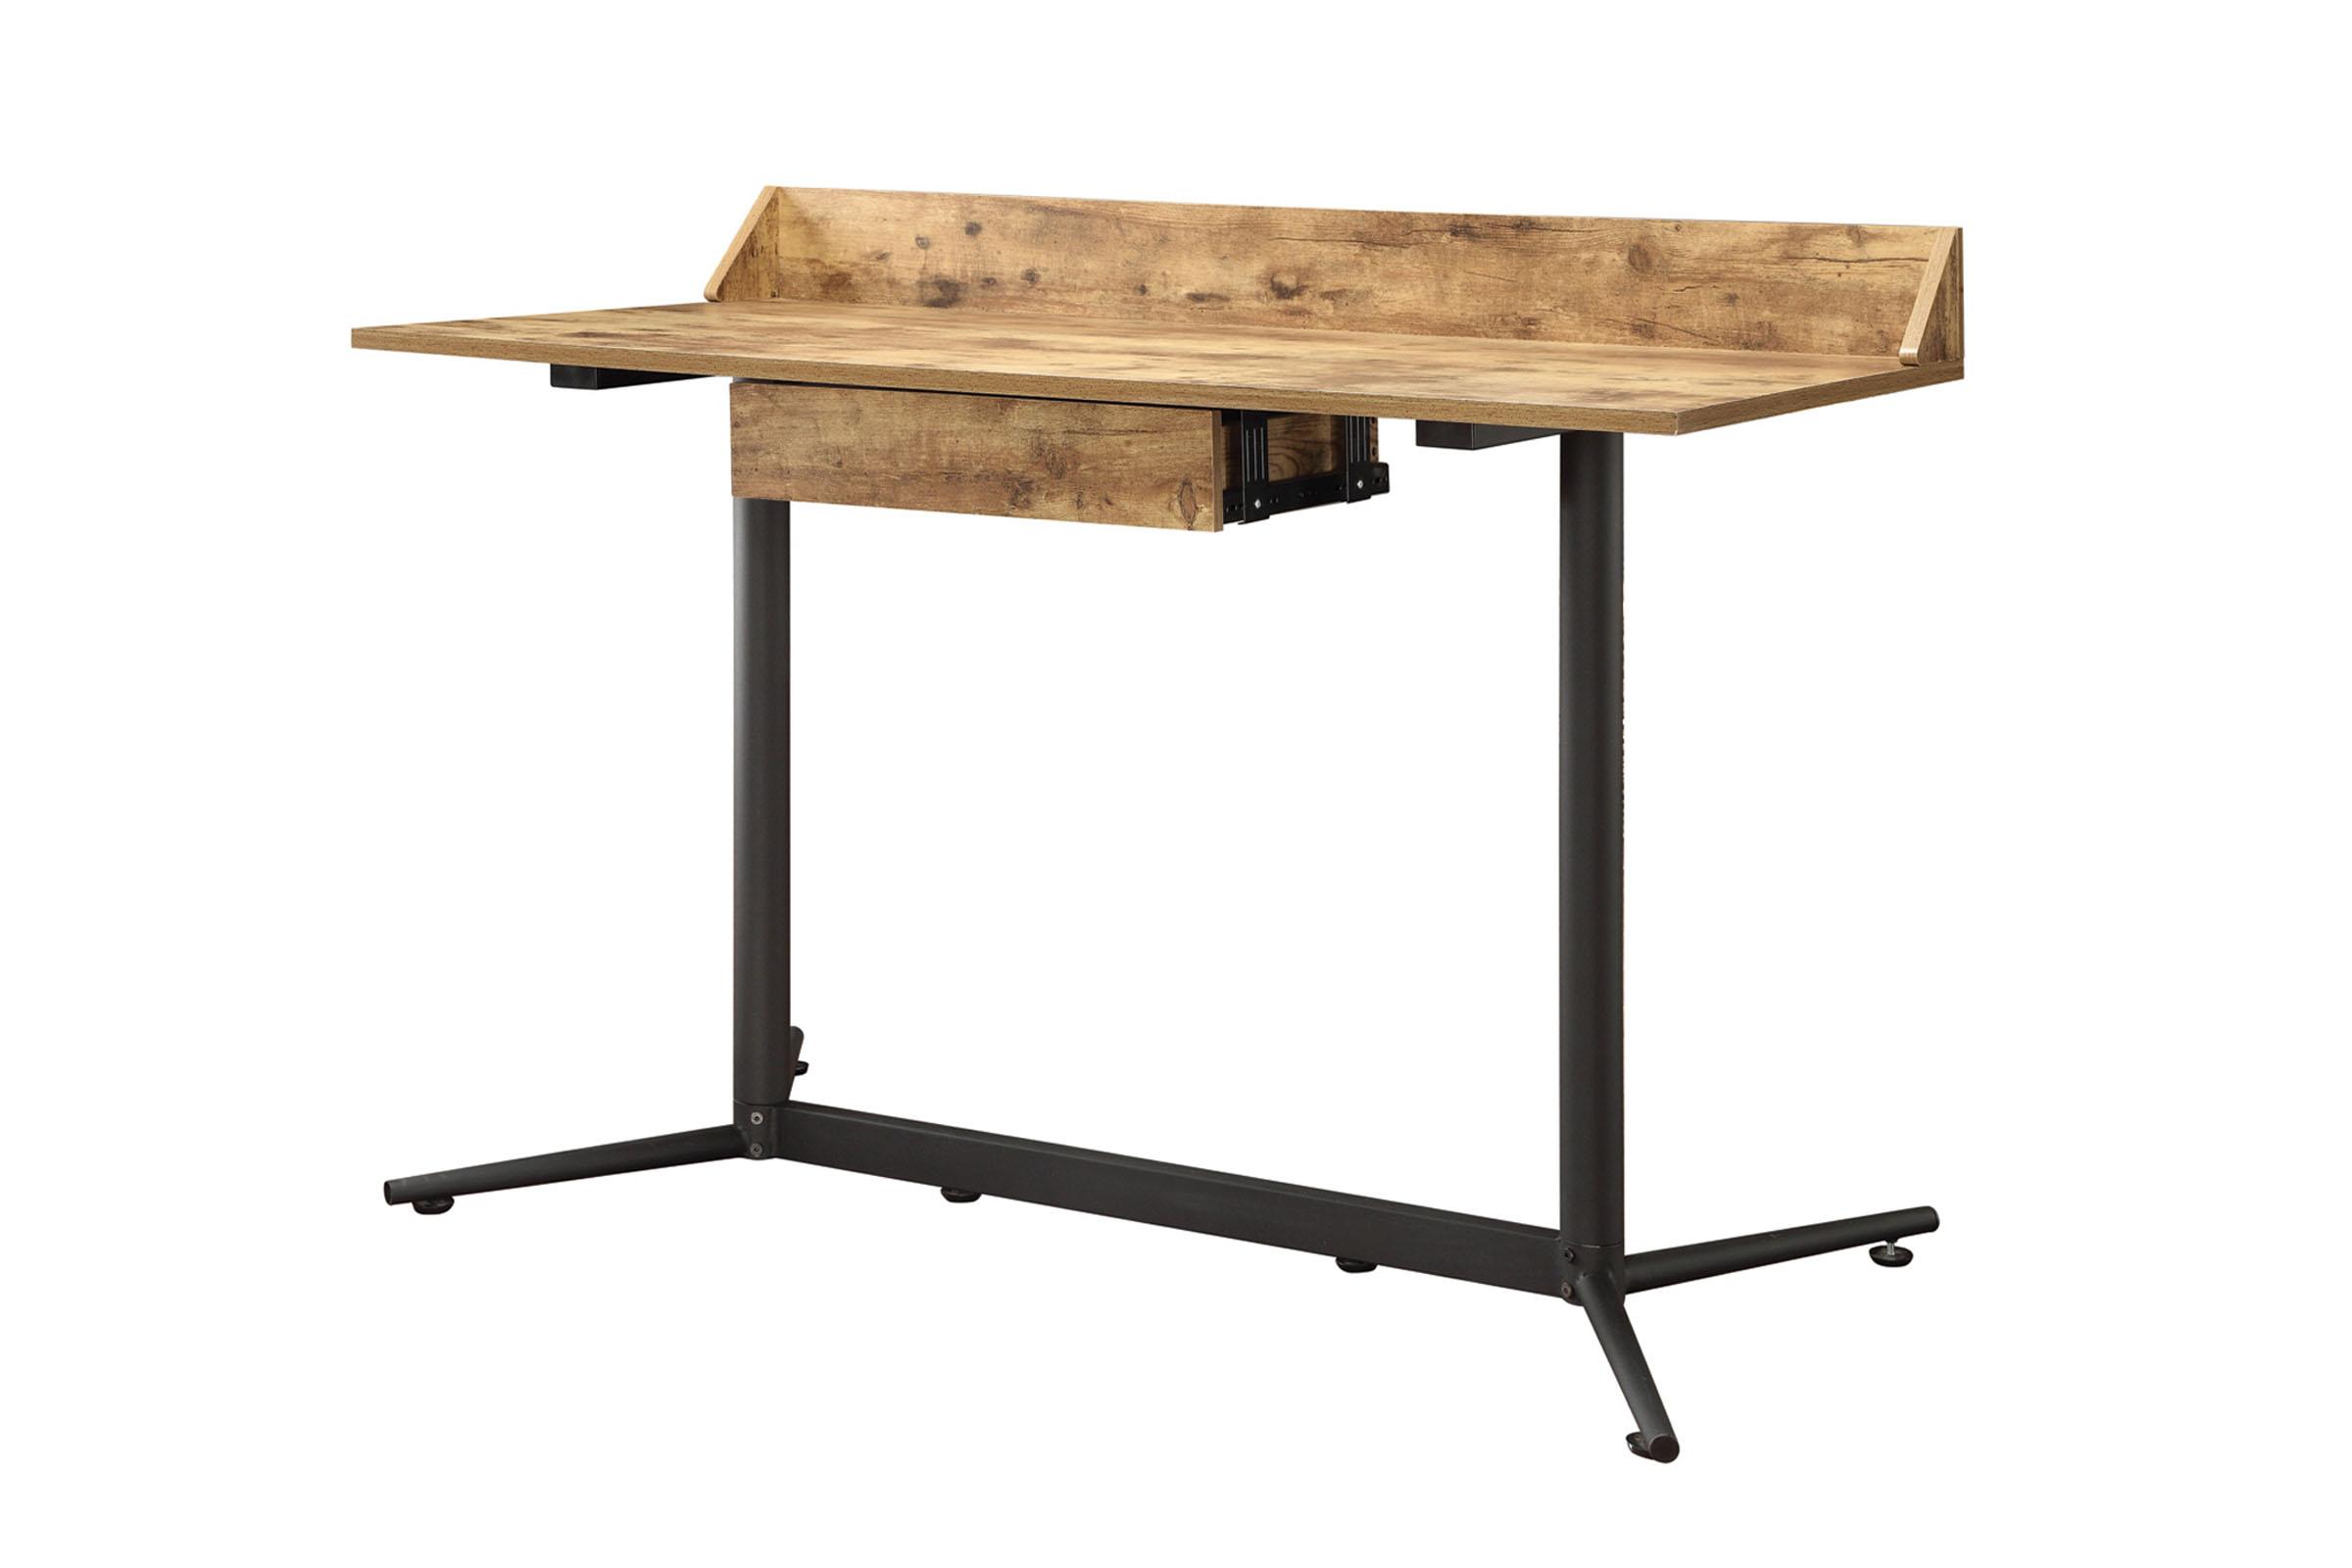 Industrial Style Computer Desk 801218 at Gardner-White